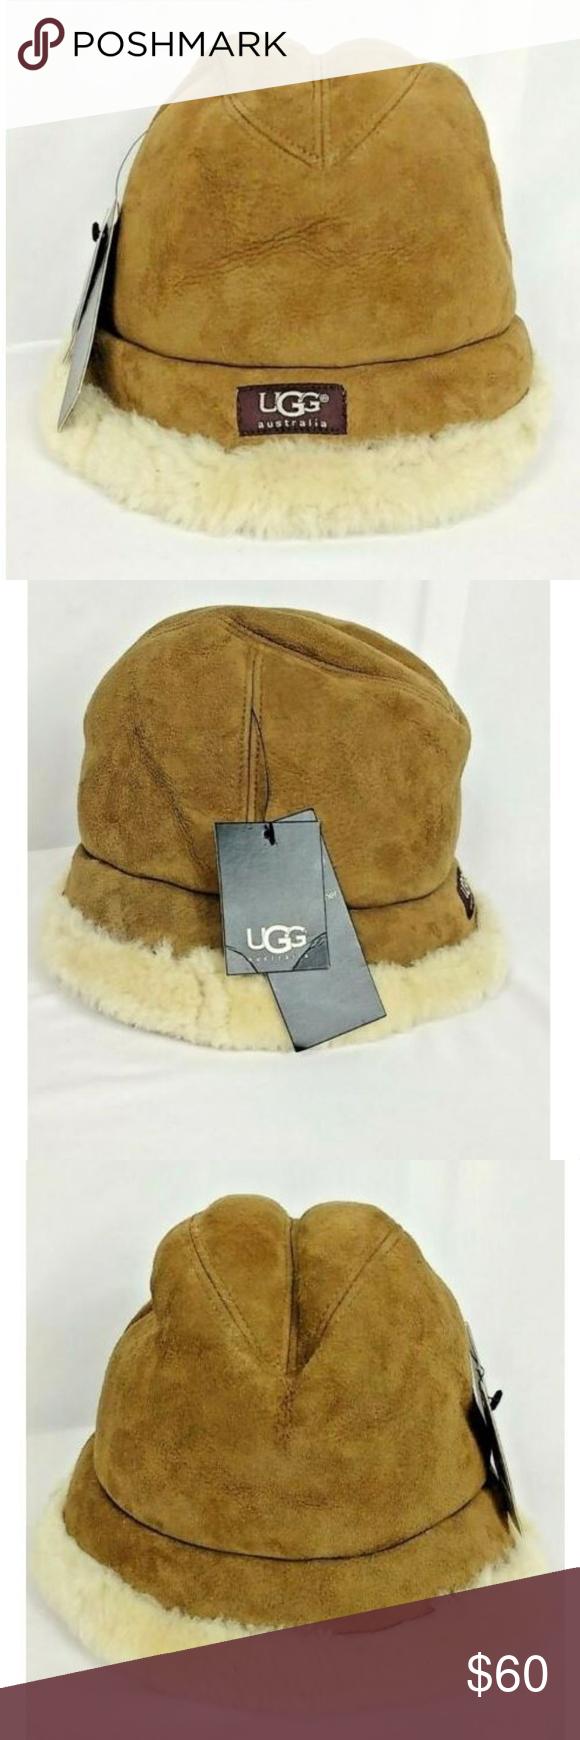 115bc75e6 UGG Australia Leather Shearling Hat Chestnut NWT Ugg Australia